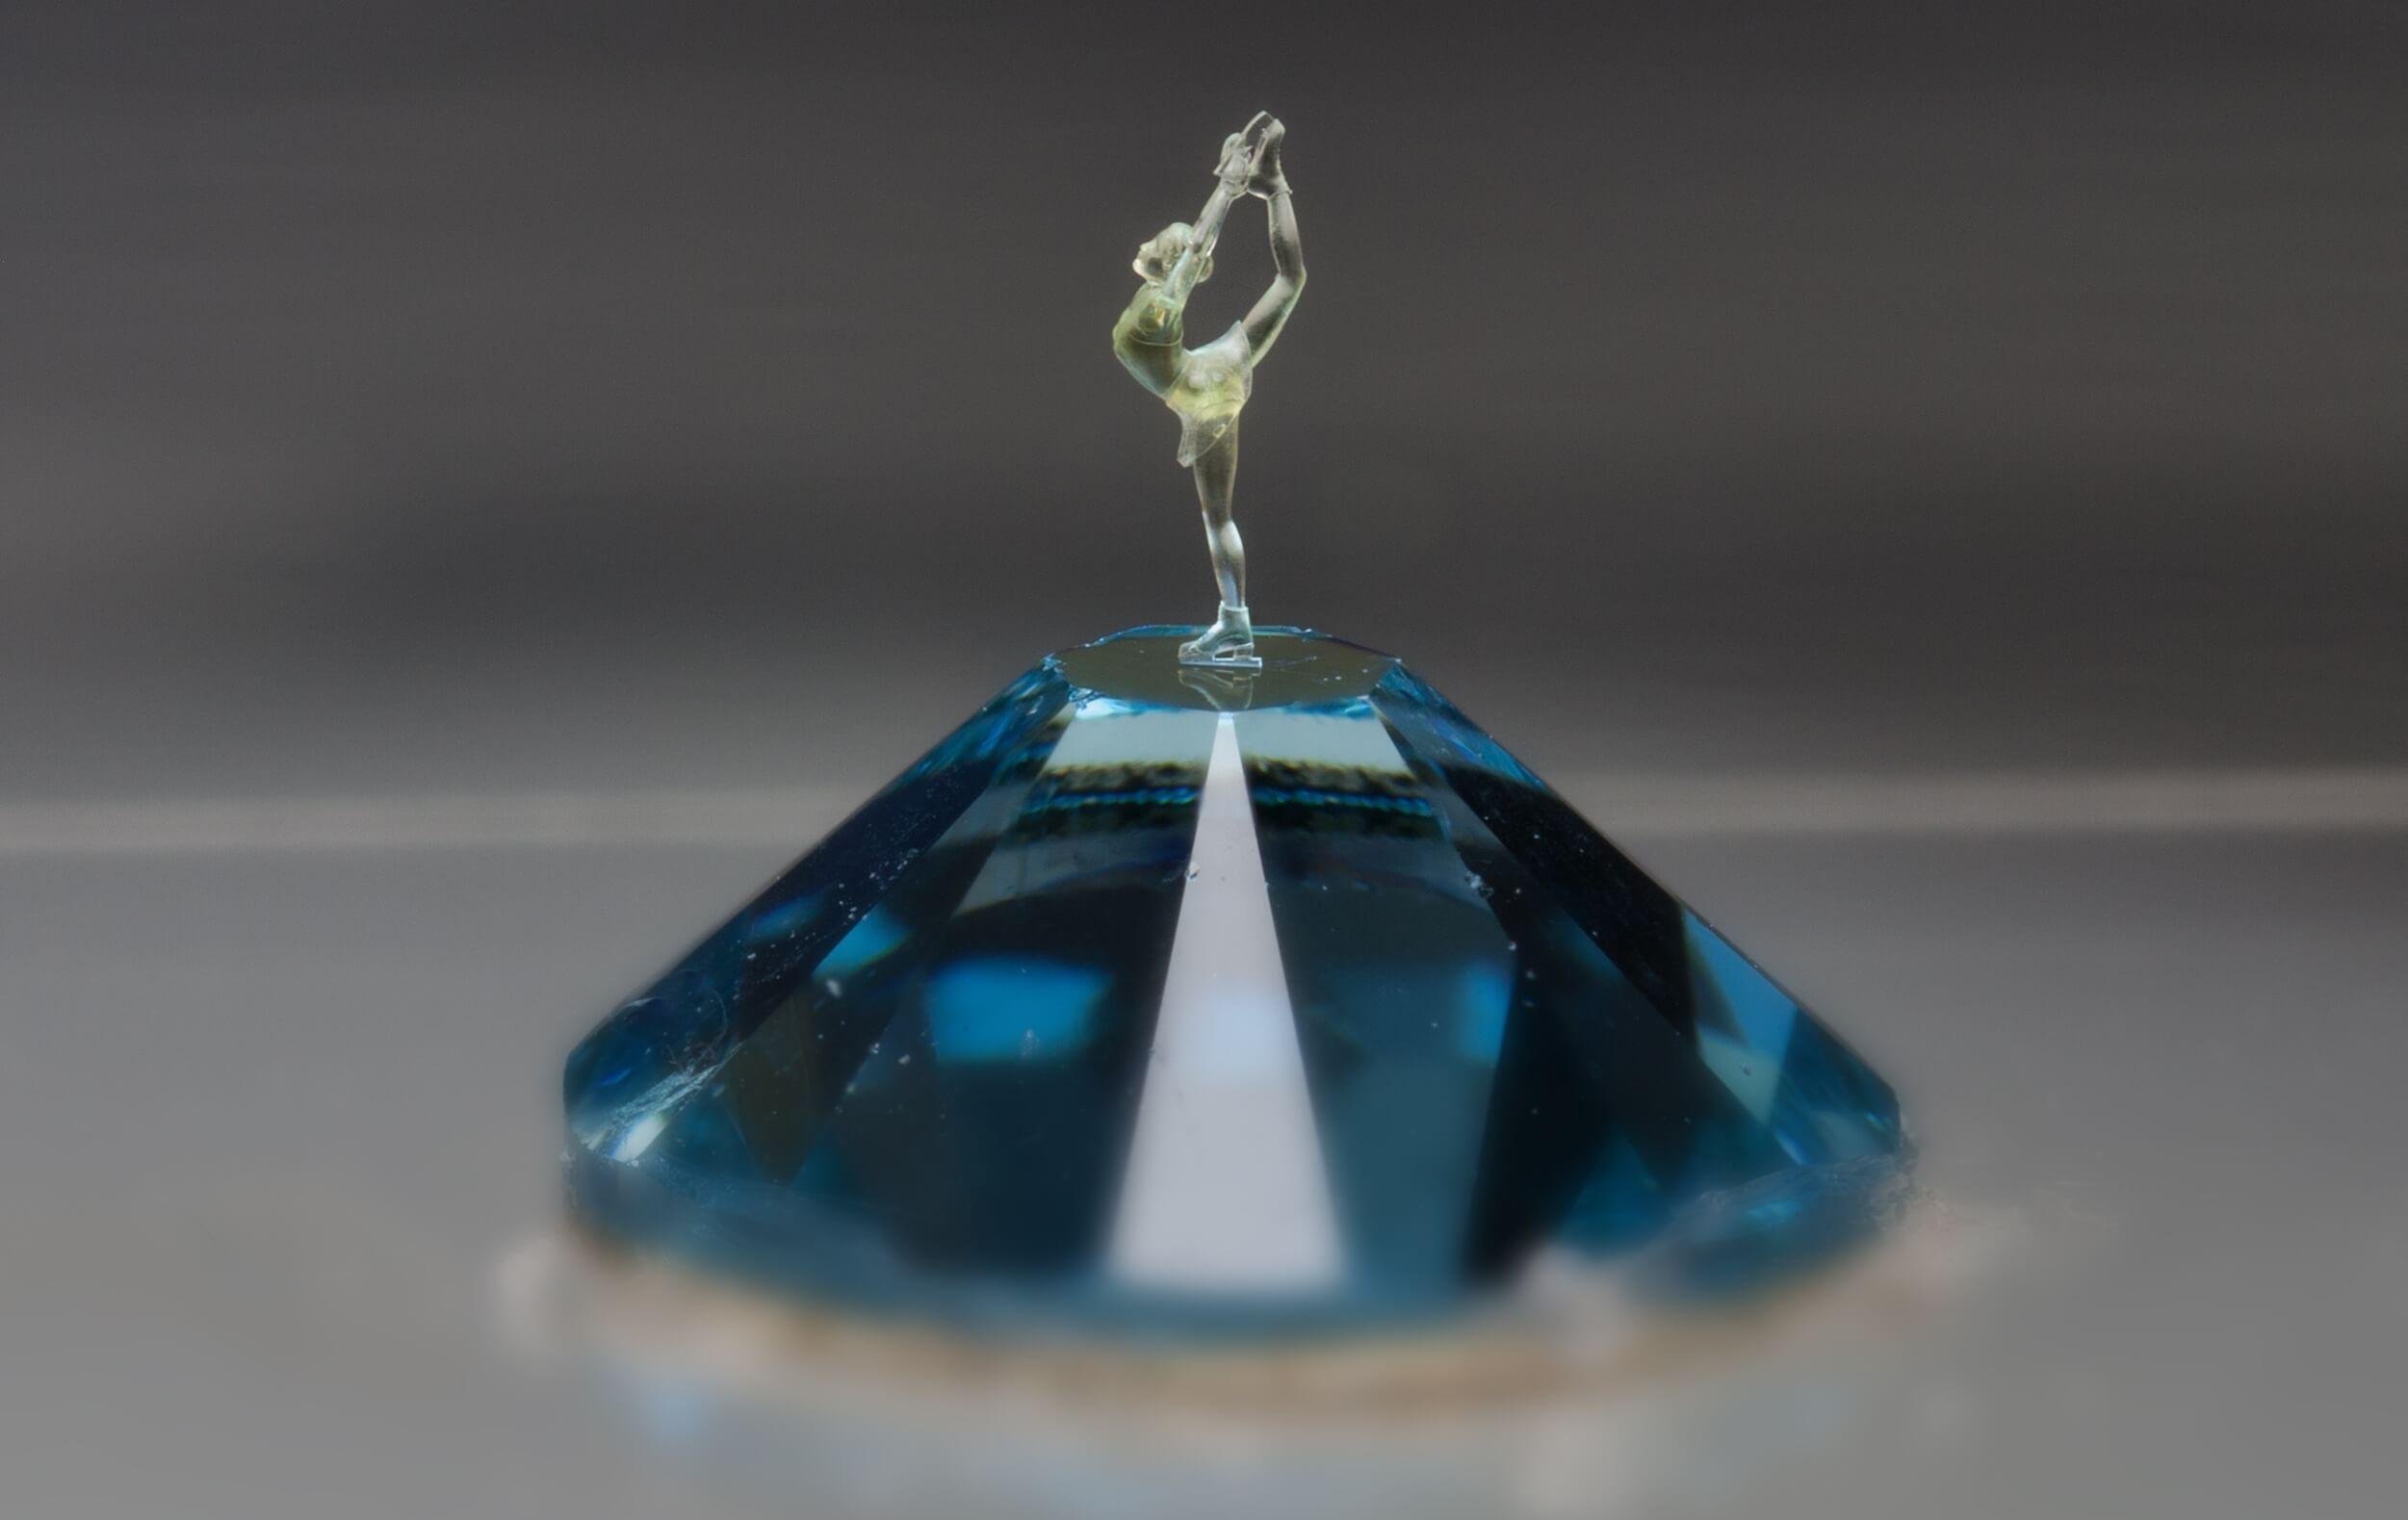 Kristall 3D-Figur